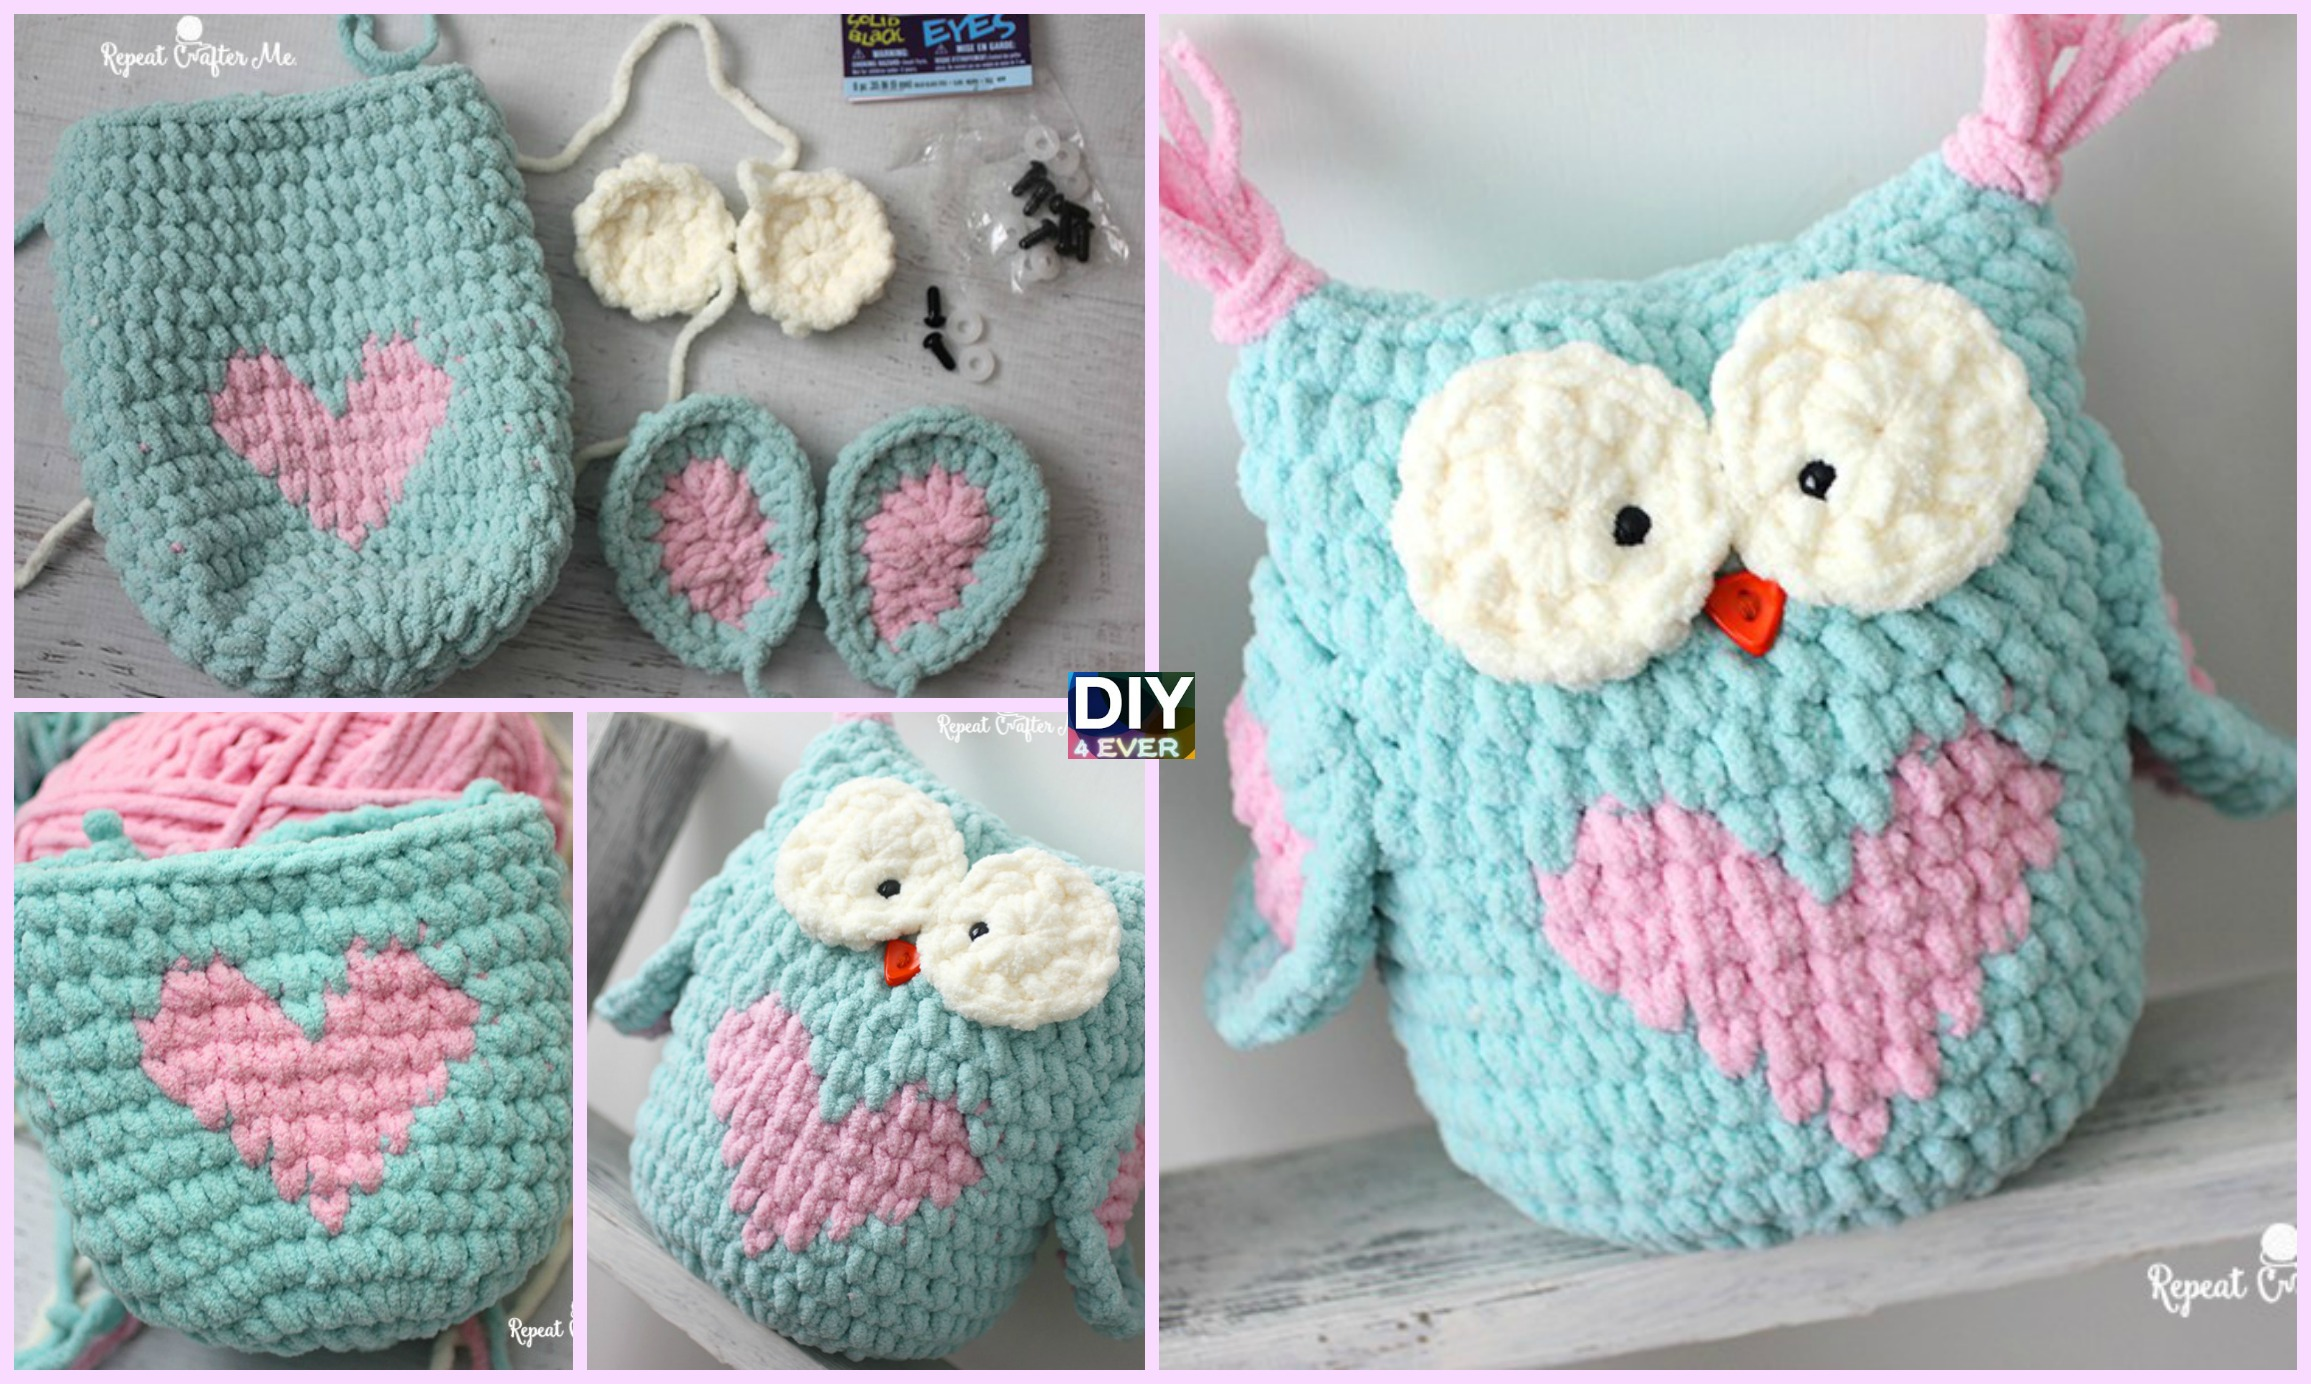 Valentine Heart Crochet Owl - Free Pattern - DIY 4 EVER